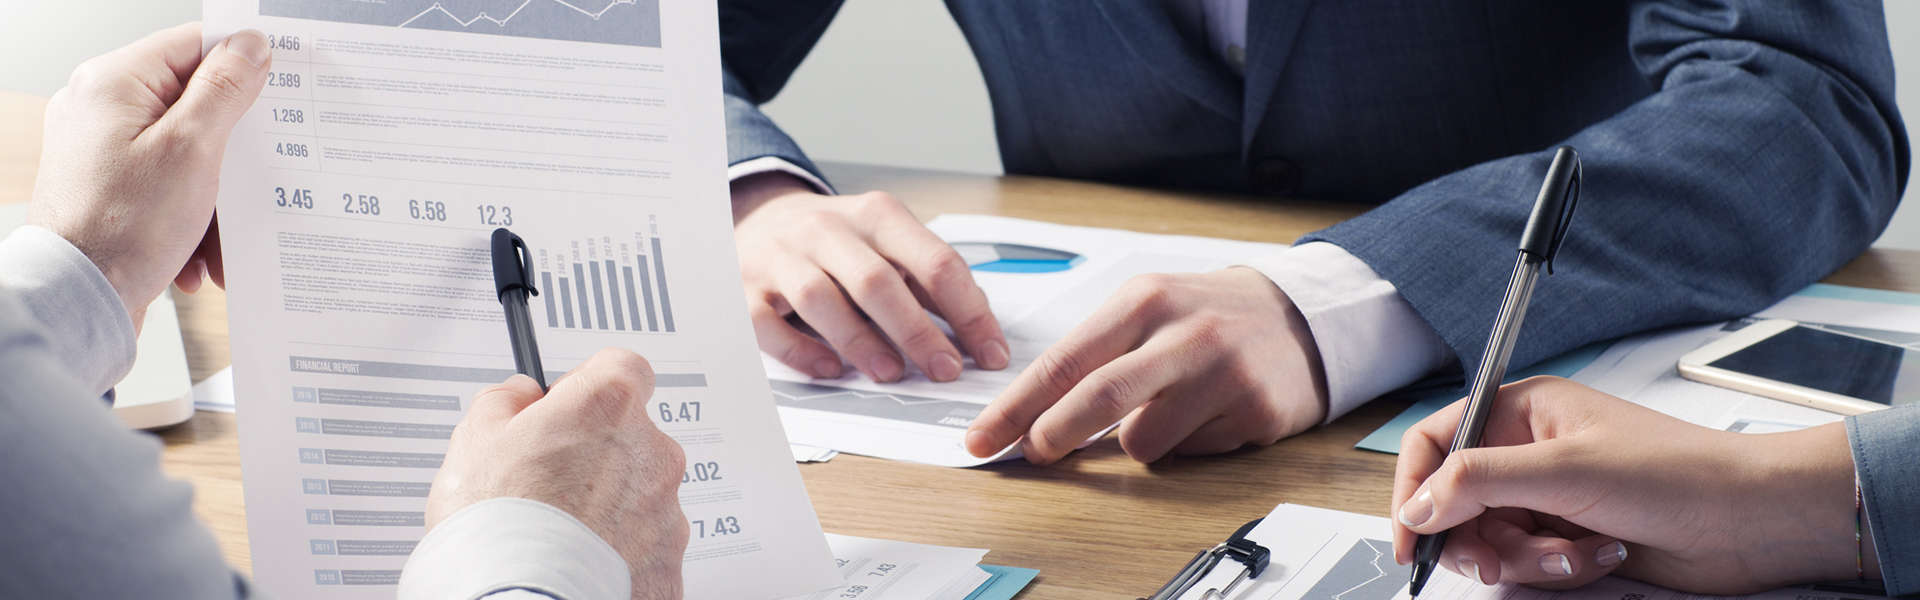 seo article writing service benefits